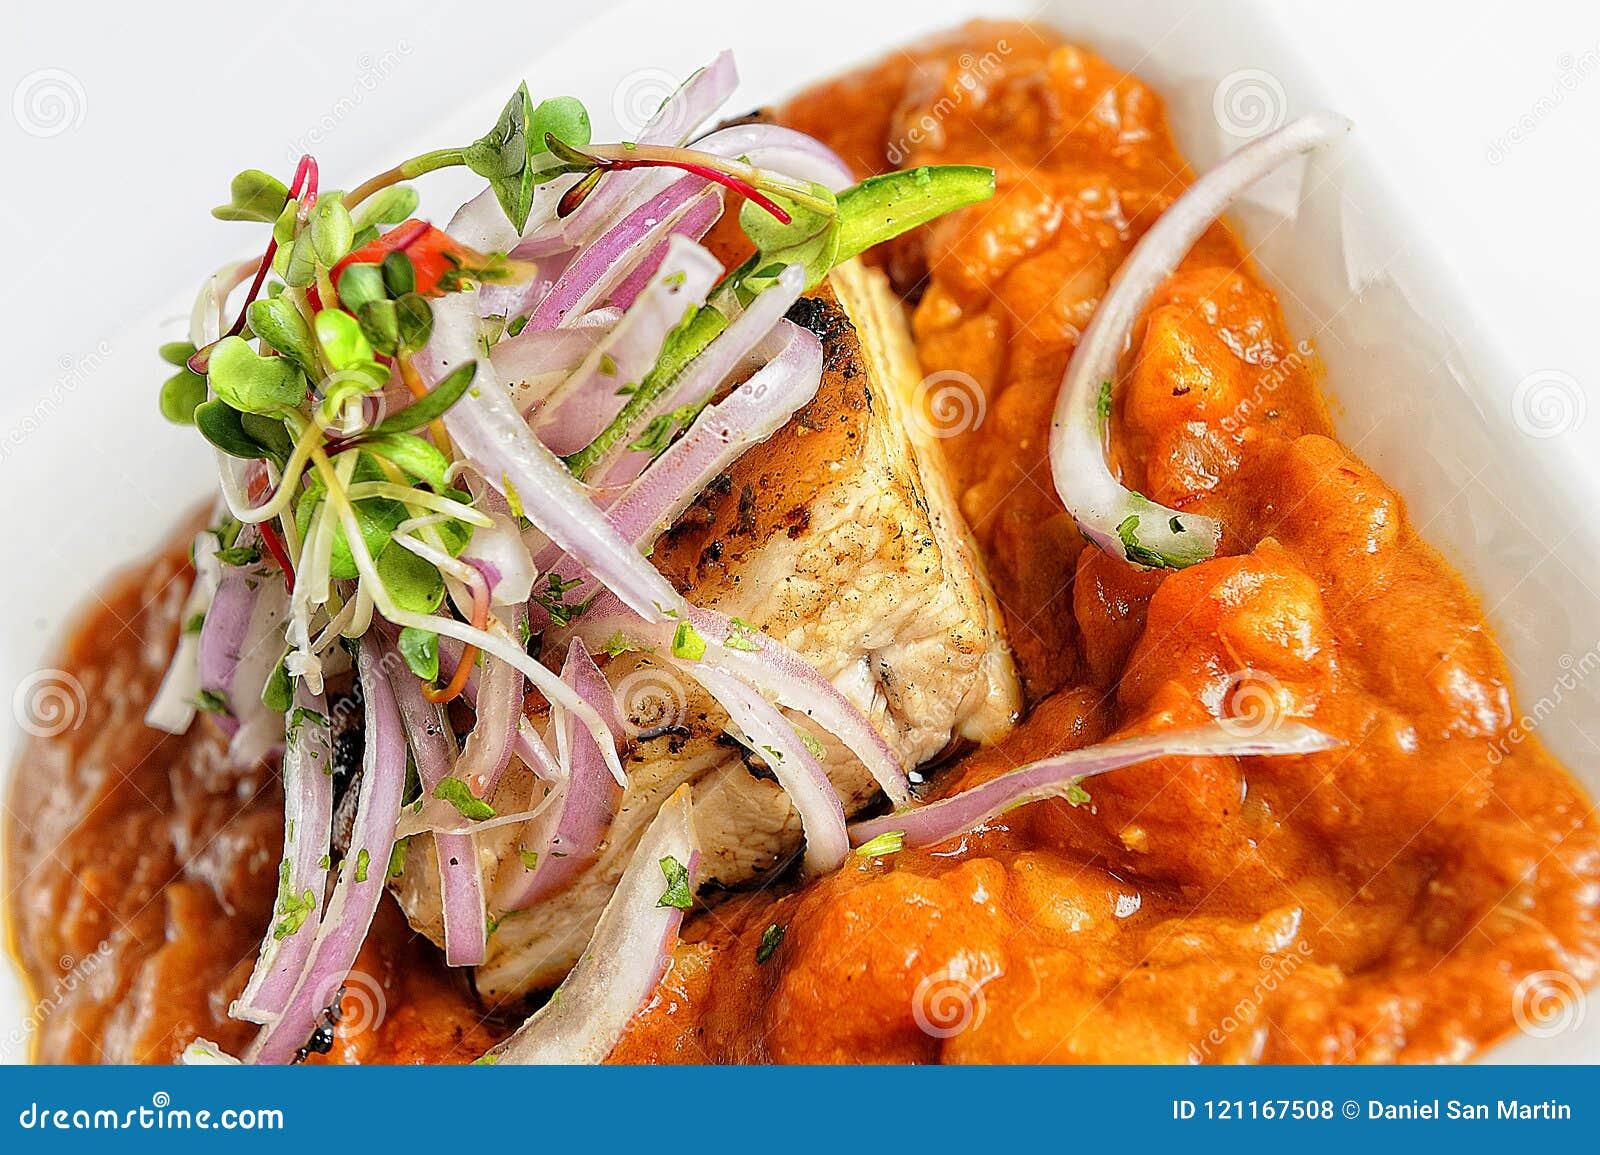 Carapulcra Peruvian Cuisine Stew Of Pork And Dehydrated Potatoes